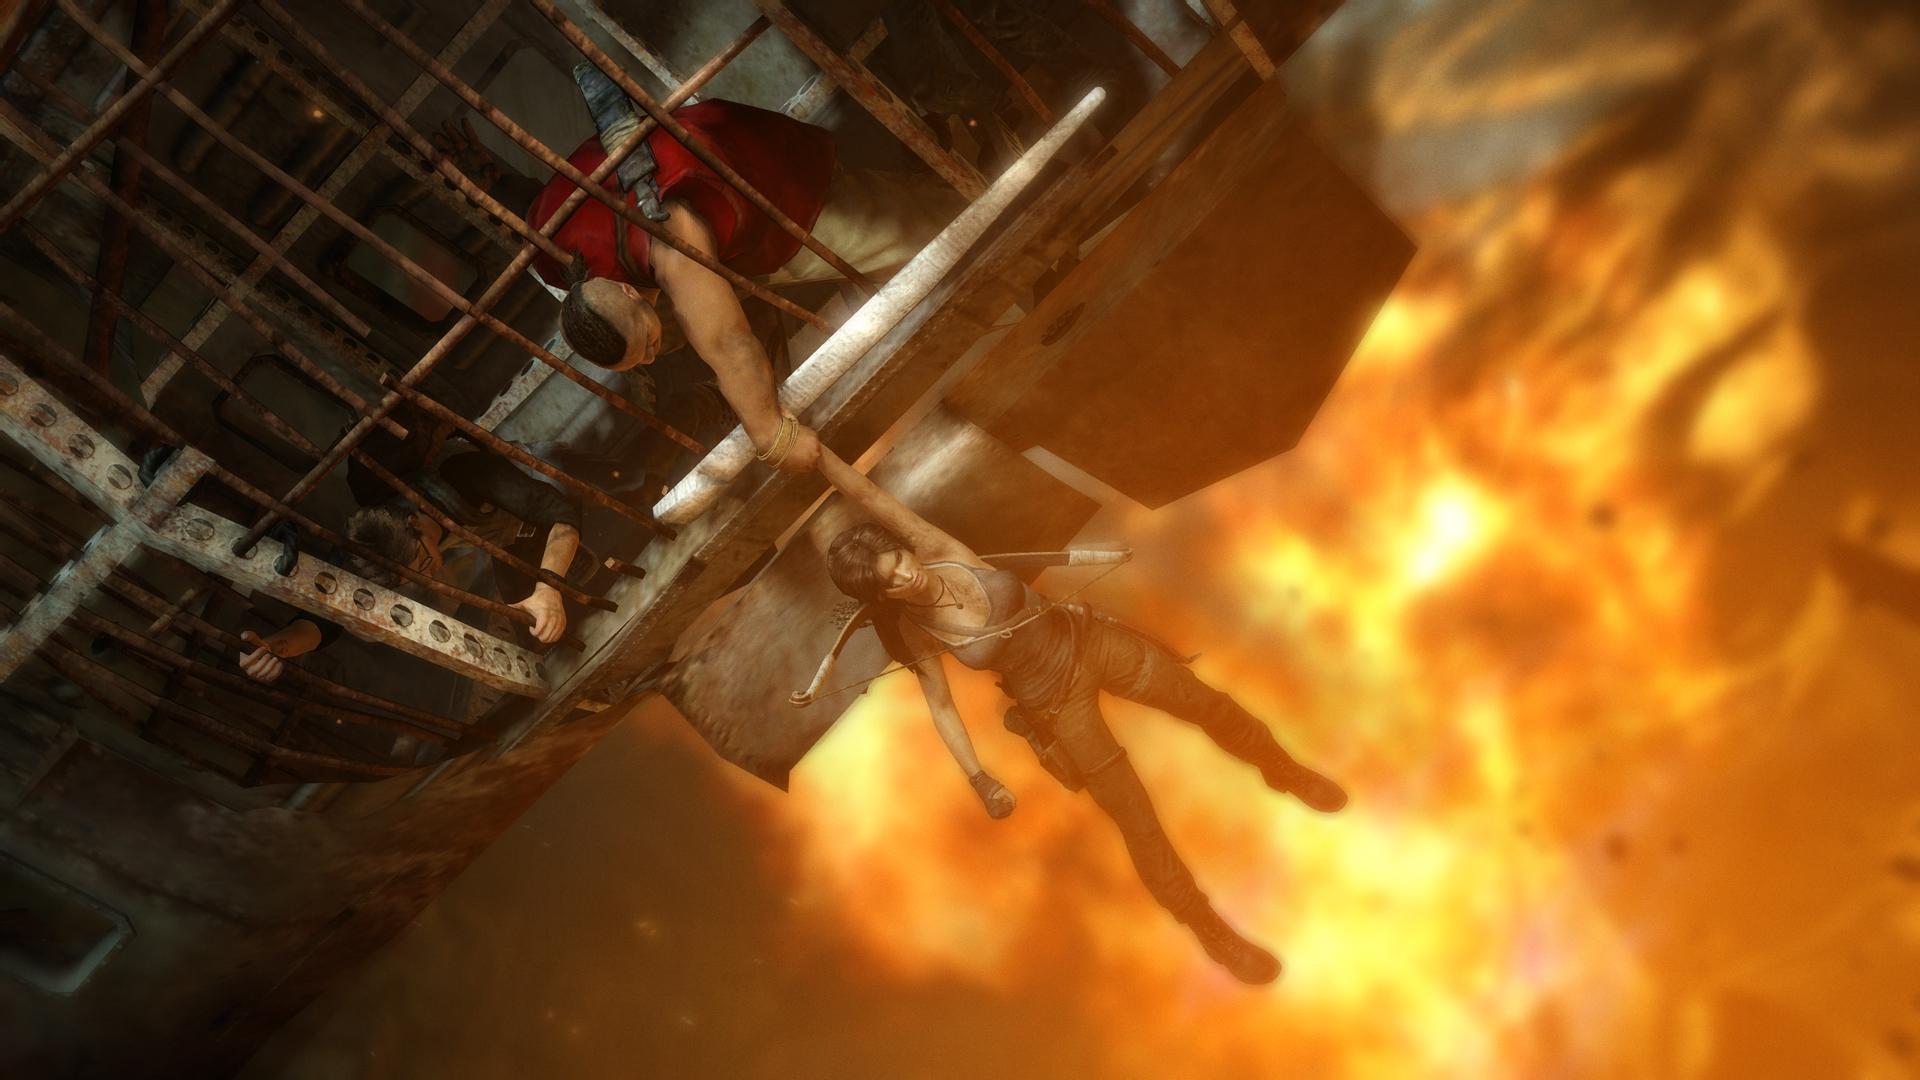 Tomb Raider Screenshots Explore Temple, Fight Samurai #25771